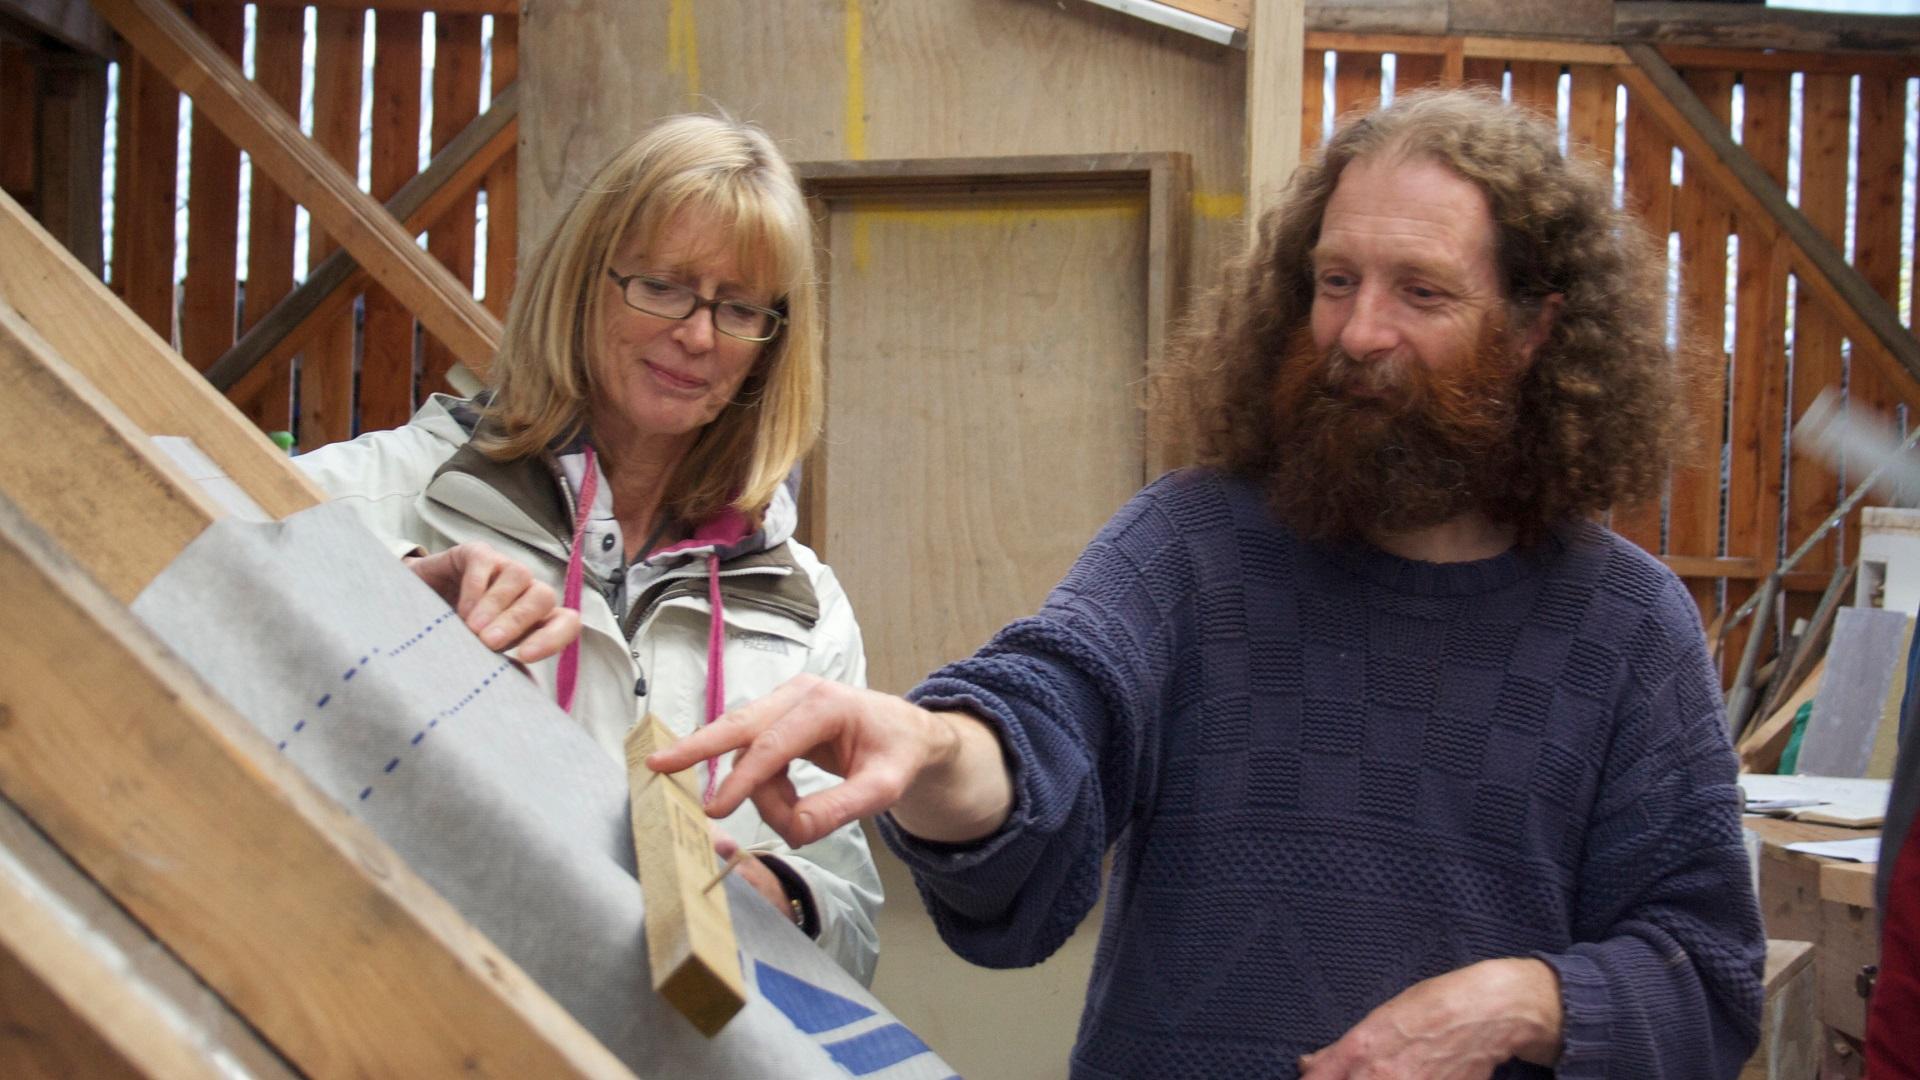 Installing insulation (demonstration)